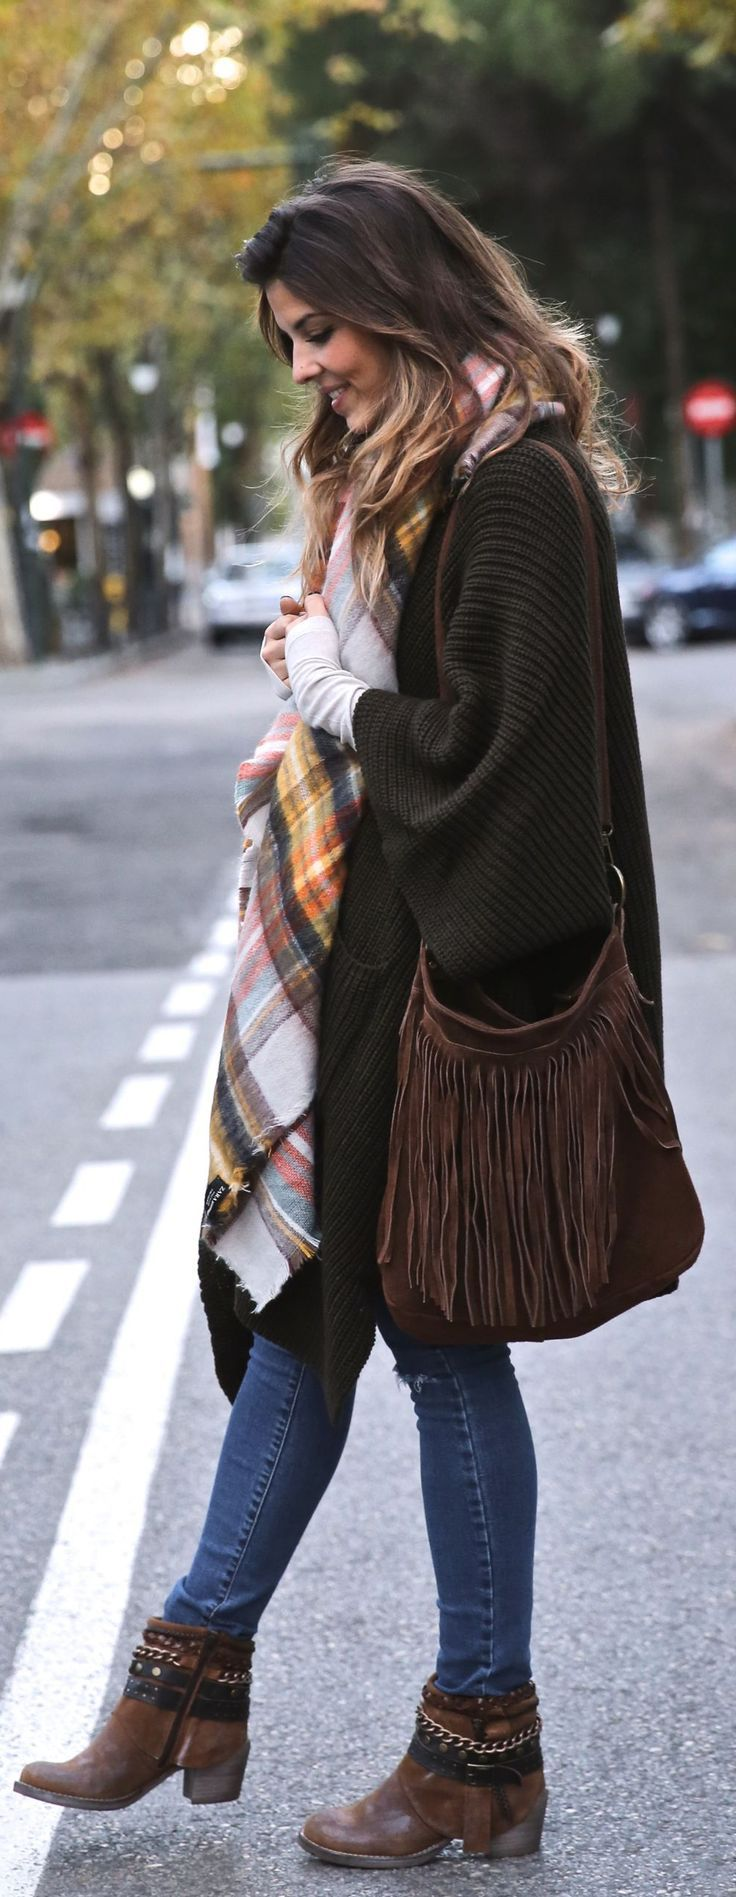 Natalia Cabezas is wearing a khaki ripped oversized knit cardigan from Asos... | Style Inspiration